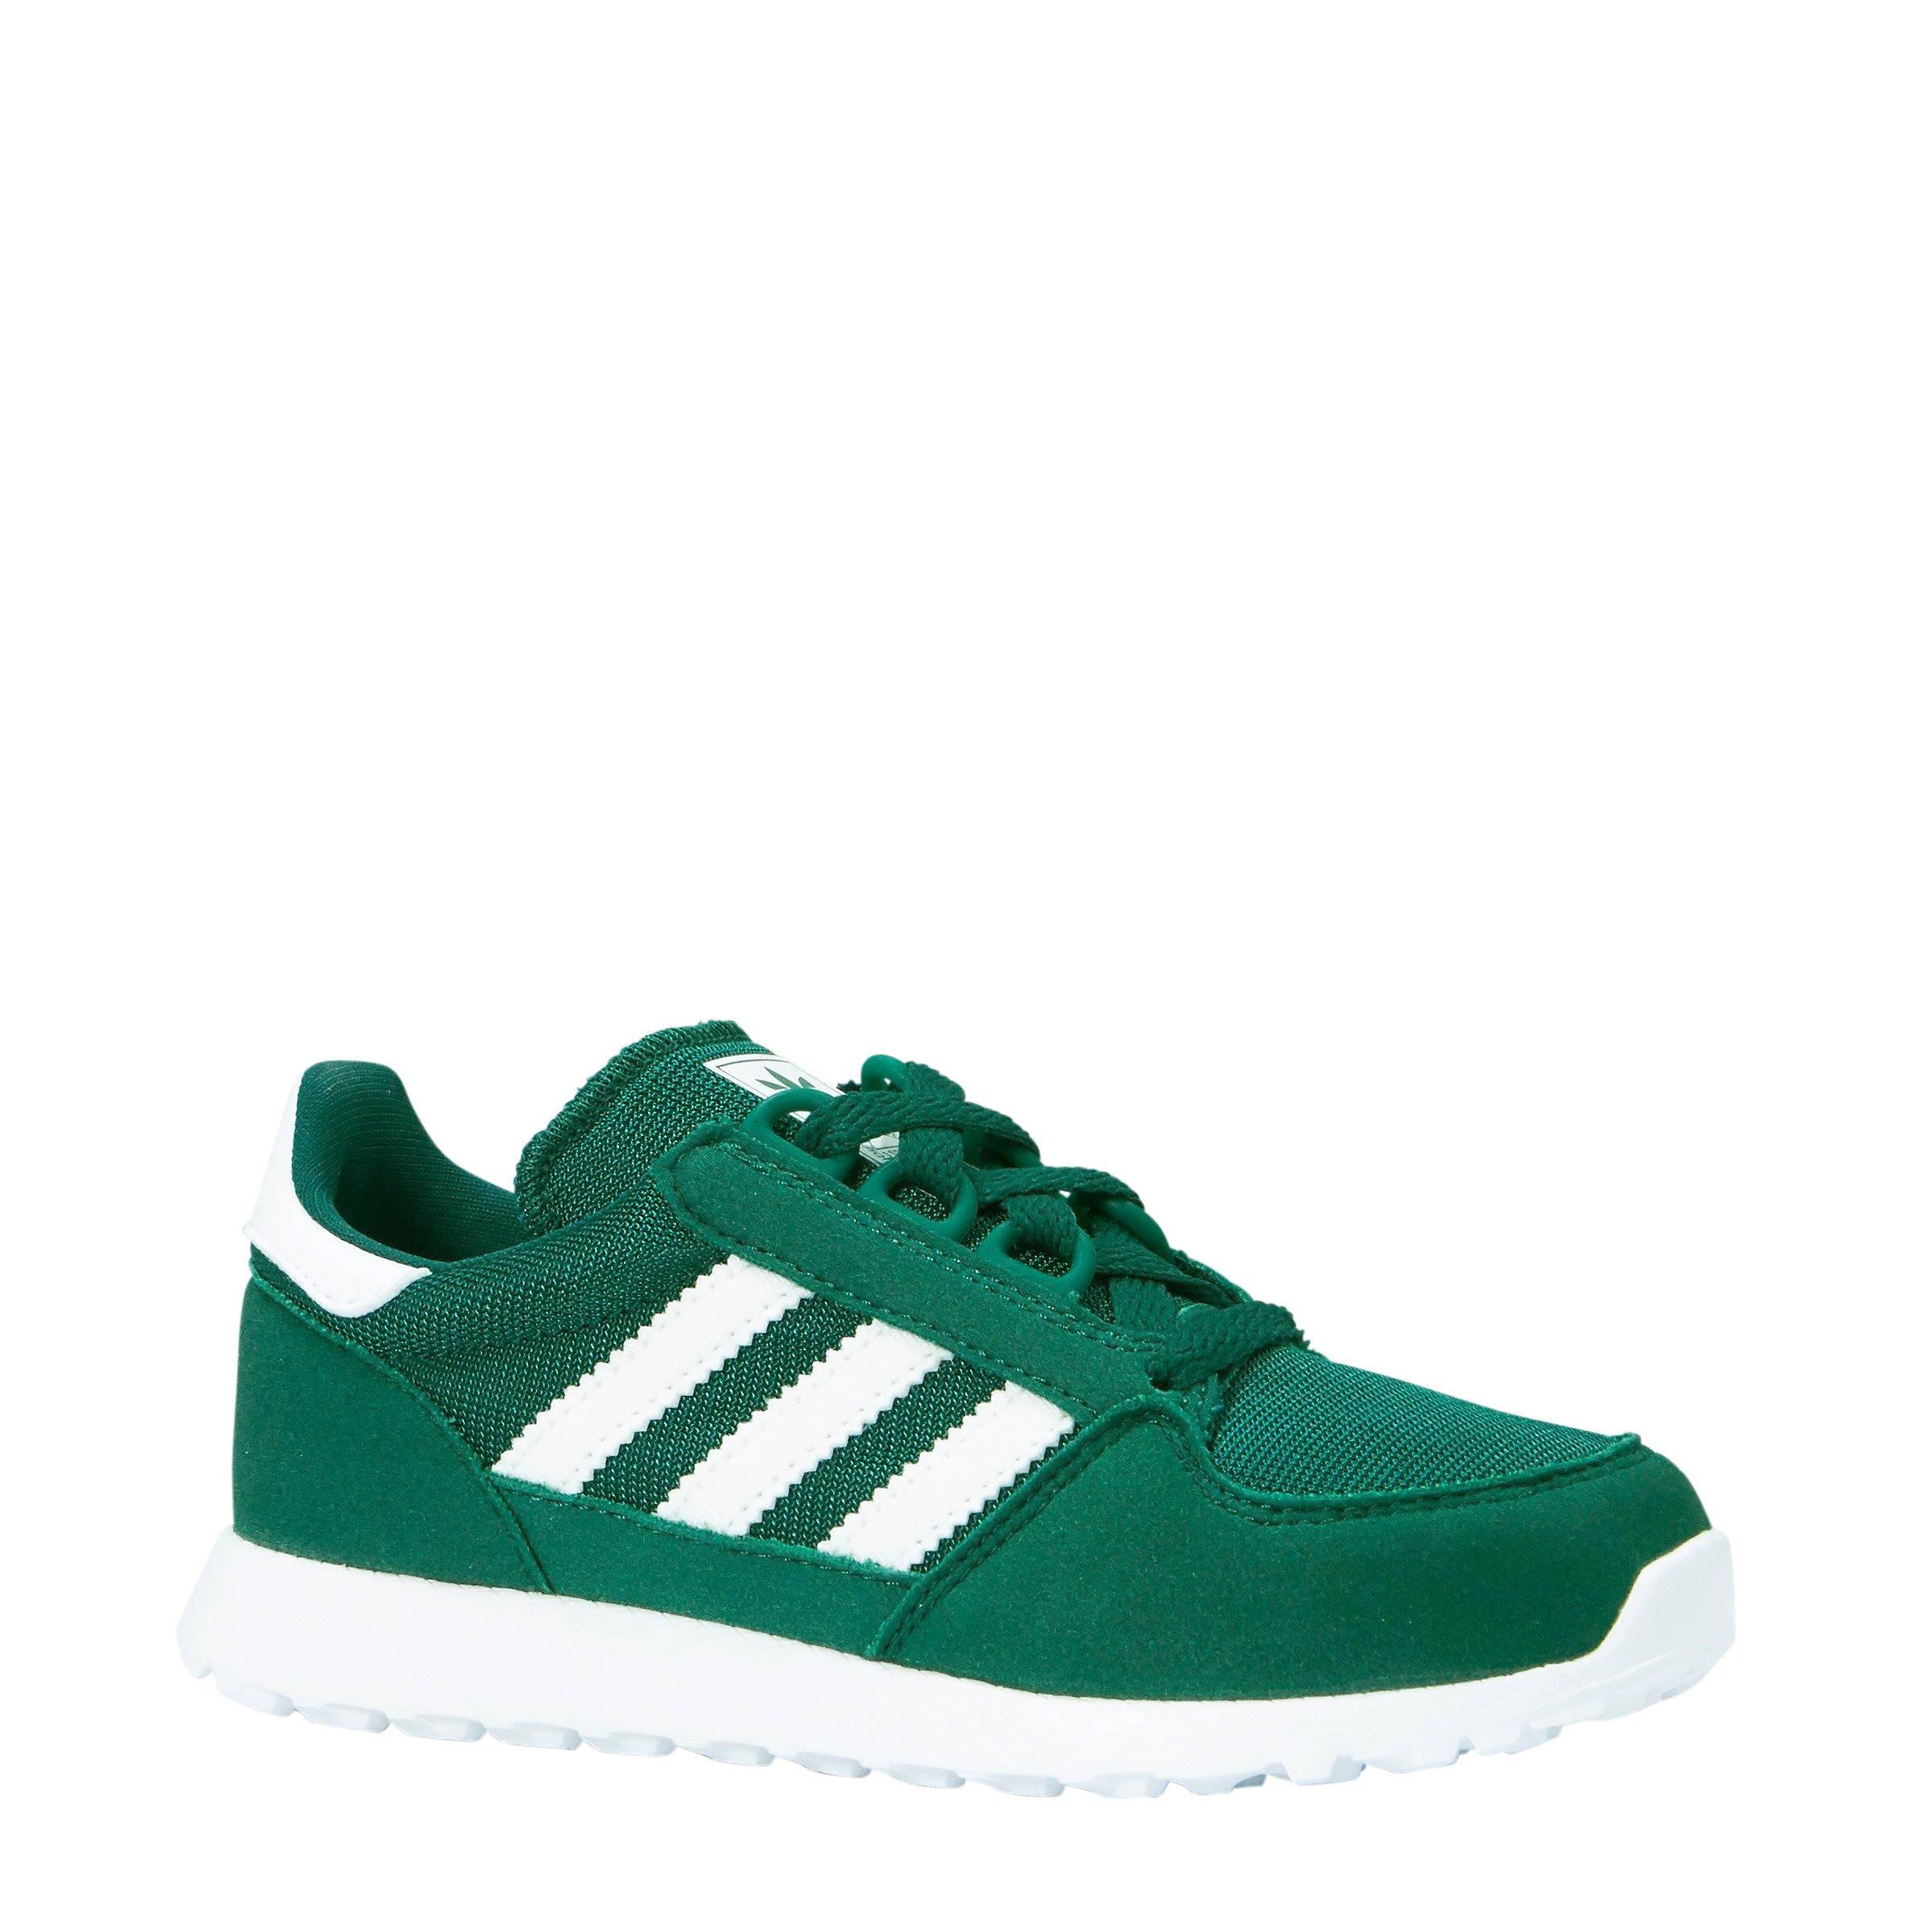 07c54d31842 Wehkamp 20 Bij Adidas Vanaf Originals Gratis Bezorging 80nkwOP